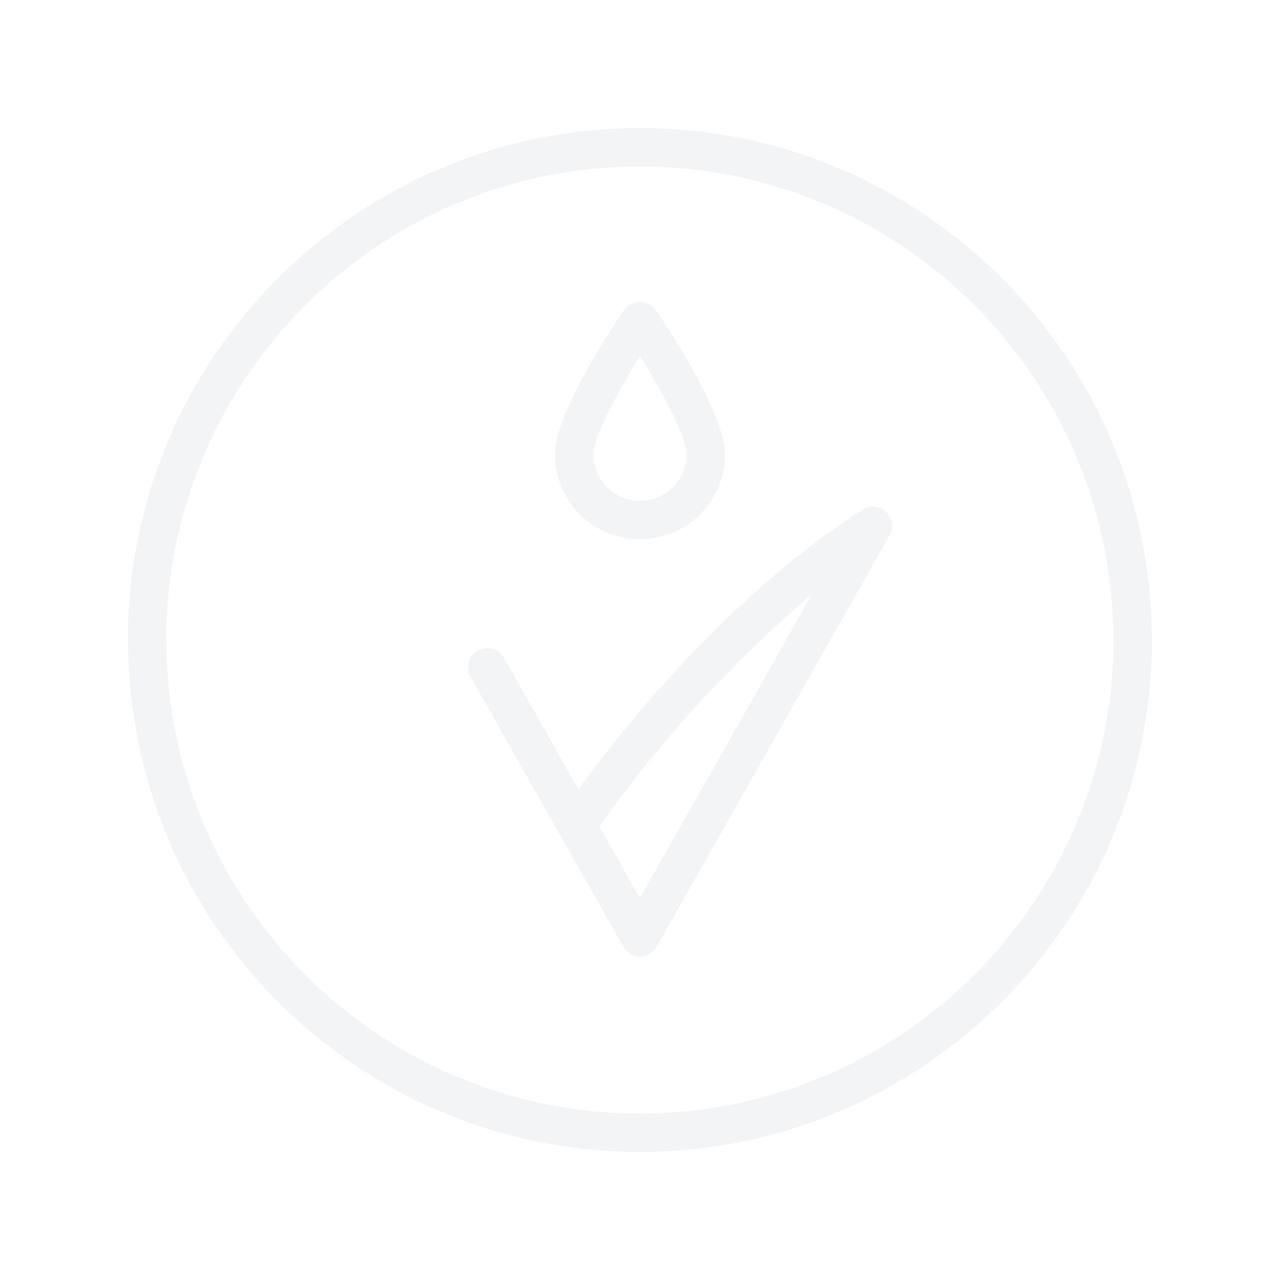 E.L.F. Eyeshadow Palette 14g